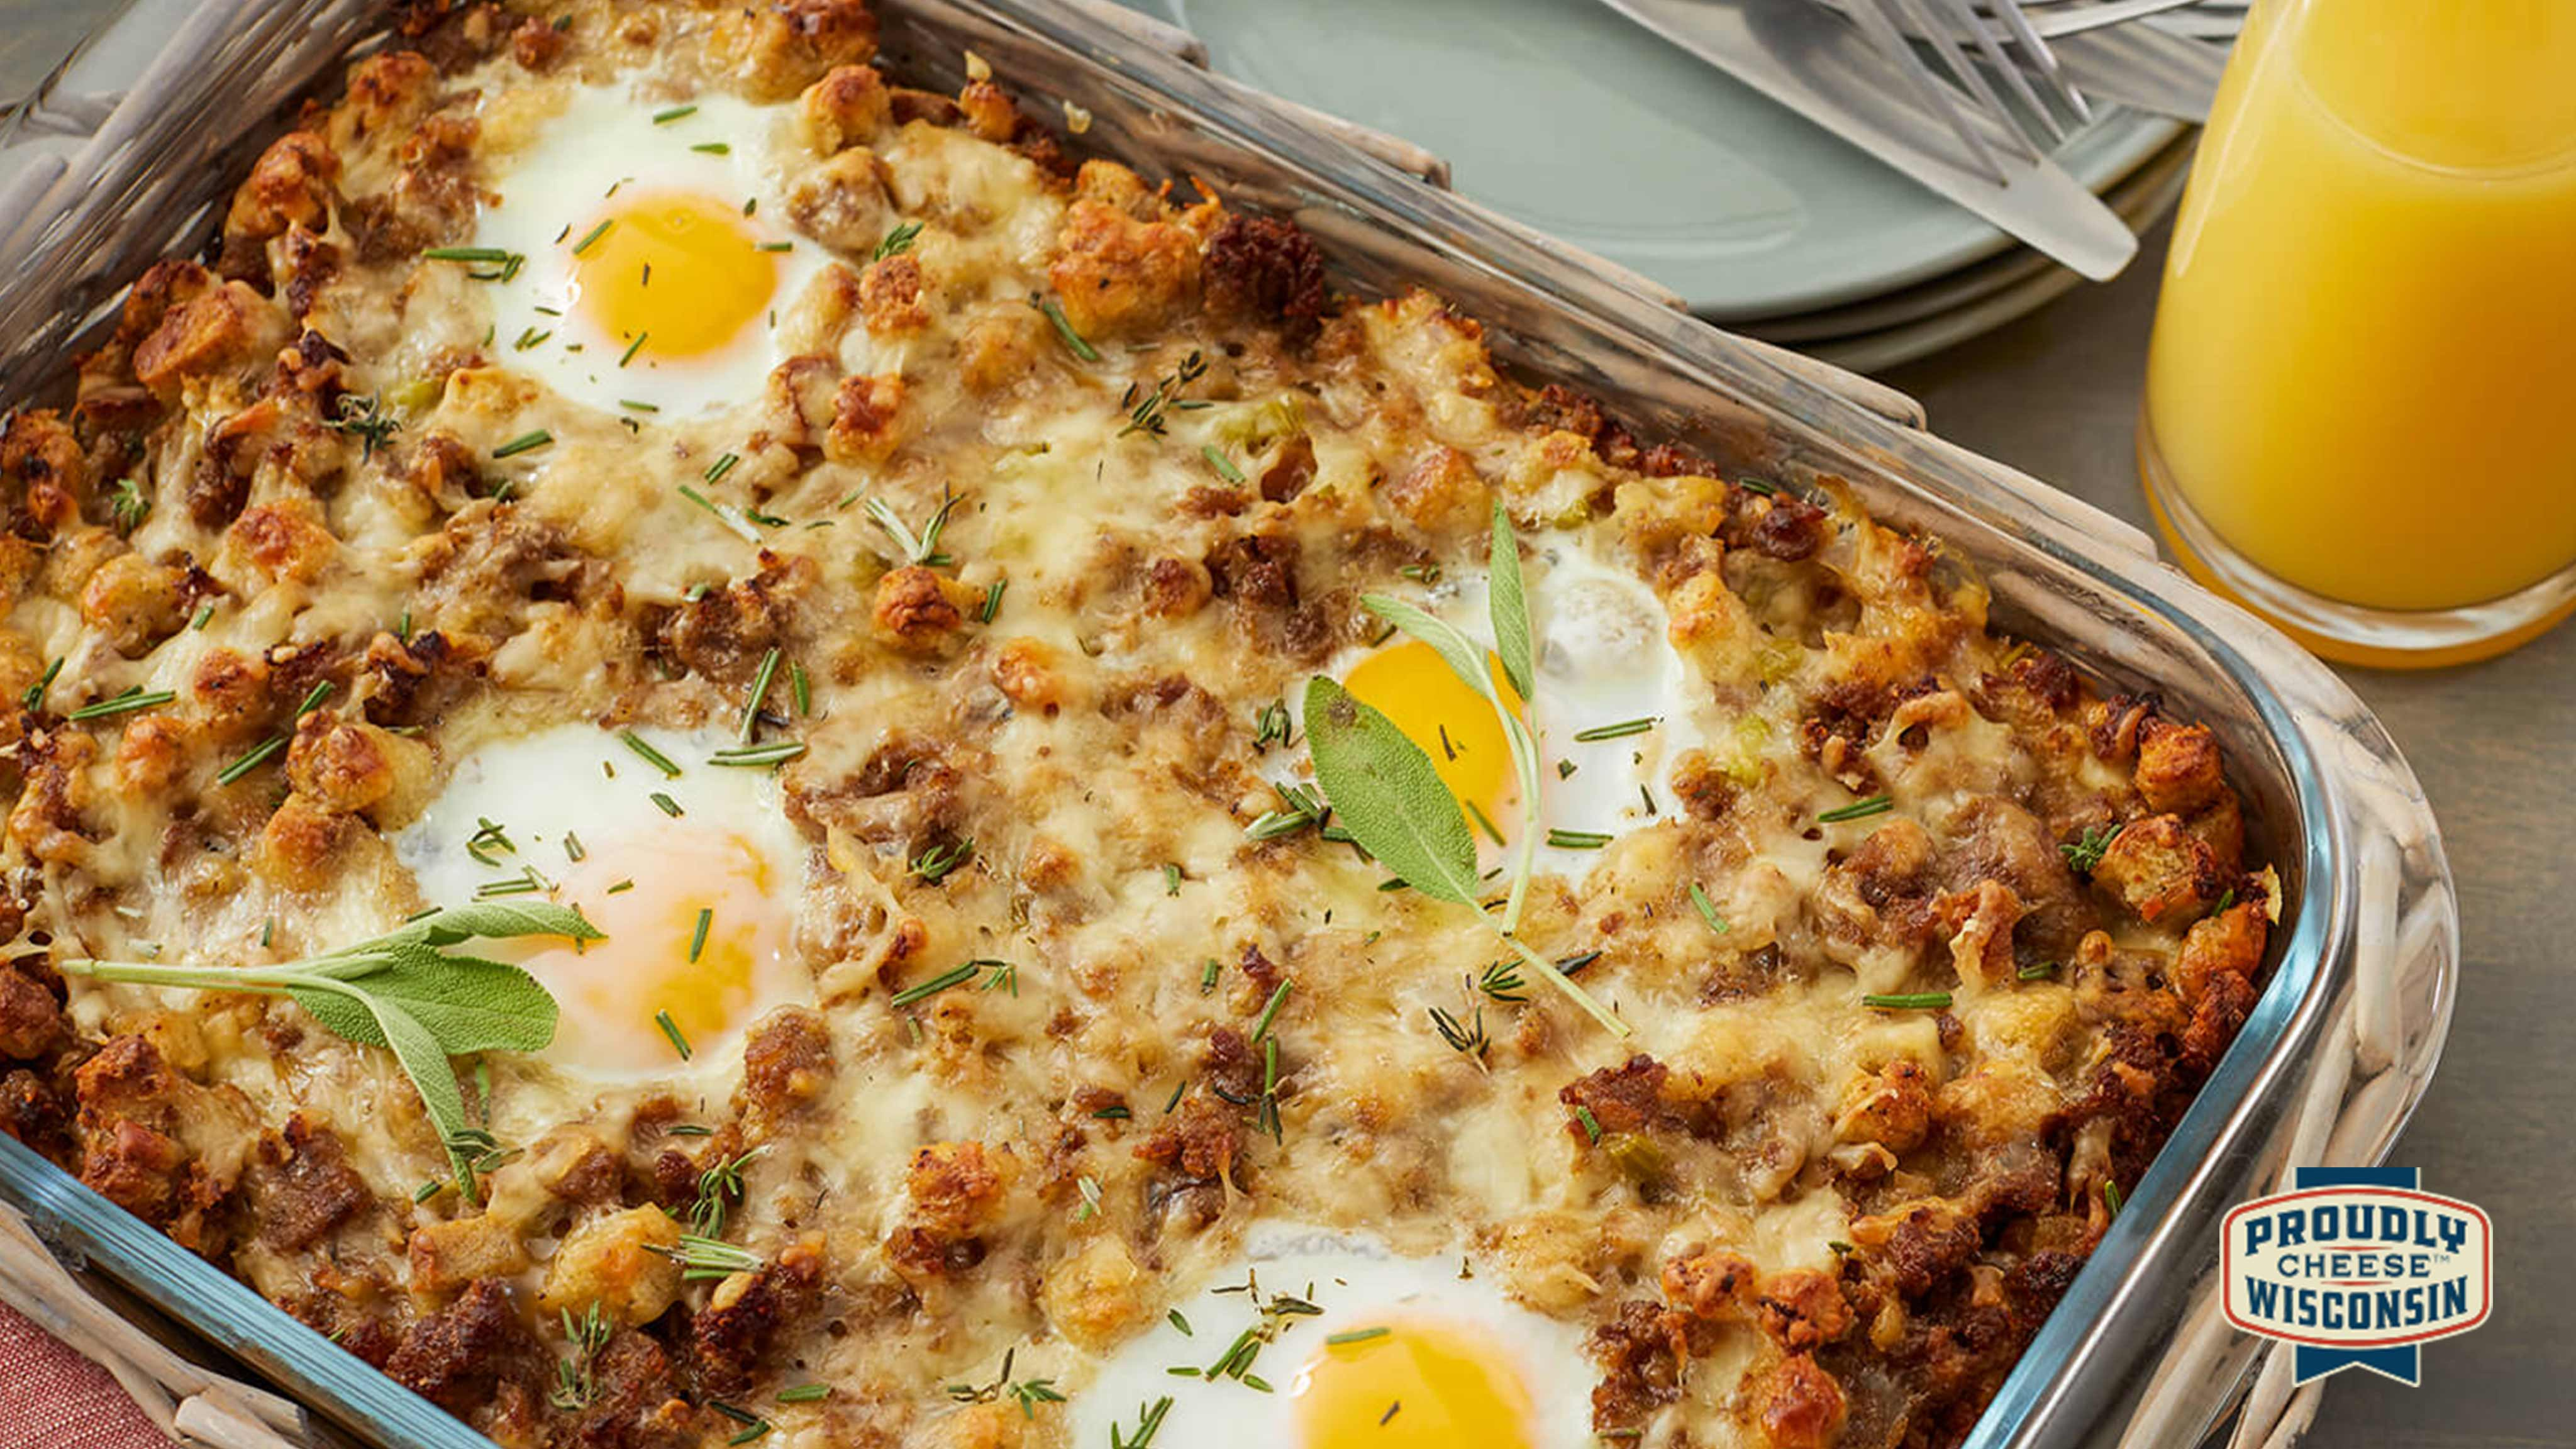 Image for Recipe Black Friday Breakfast Casserole